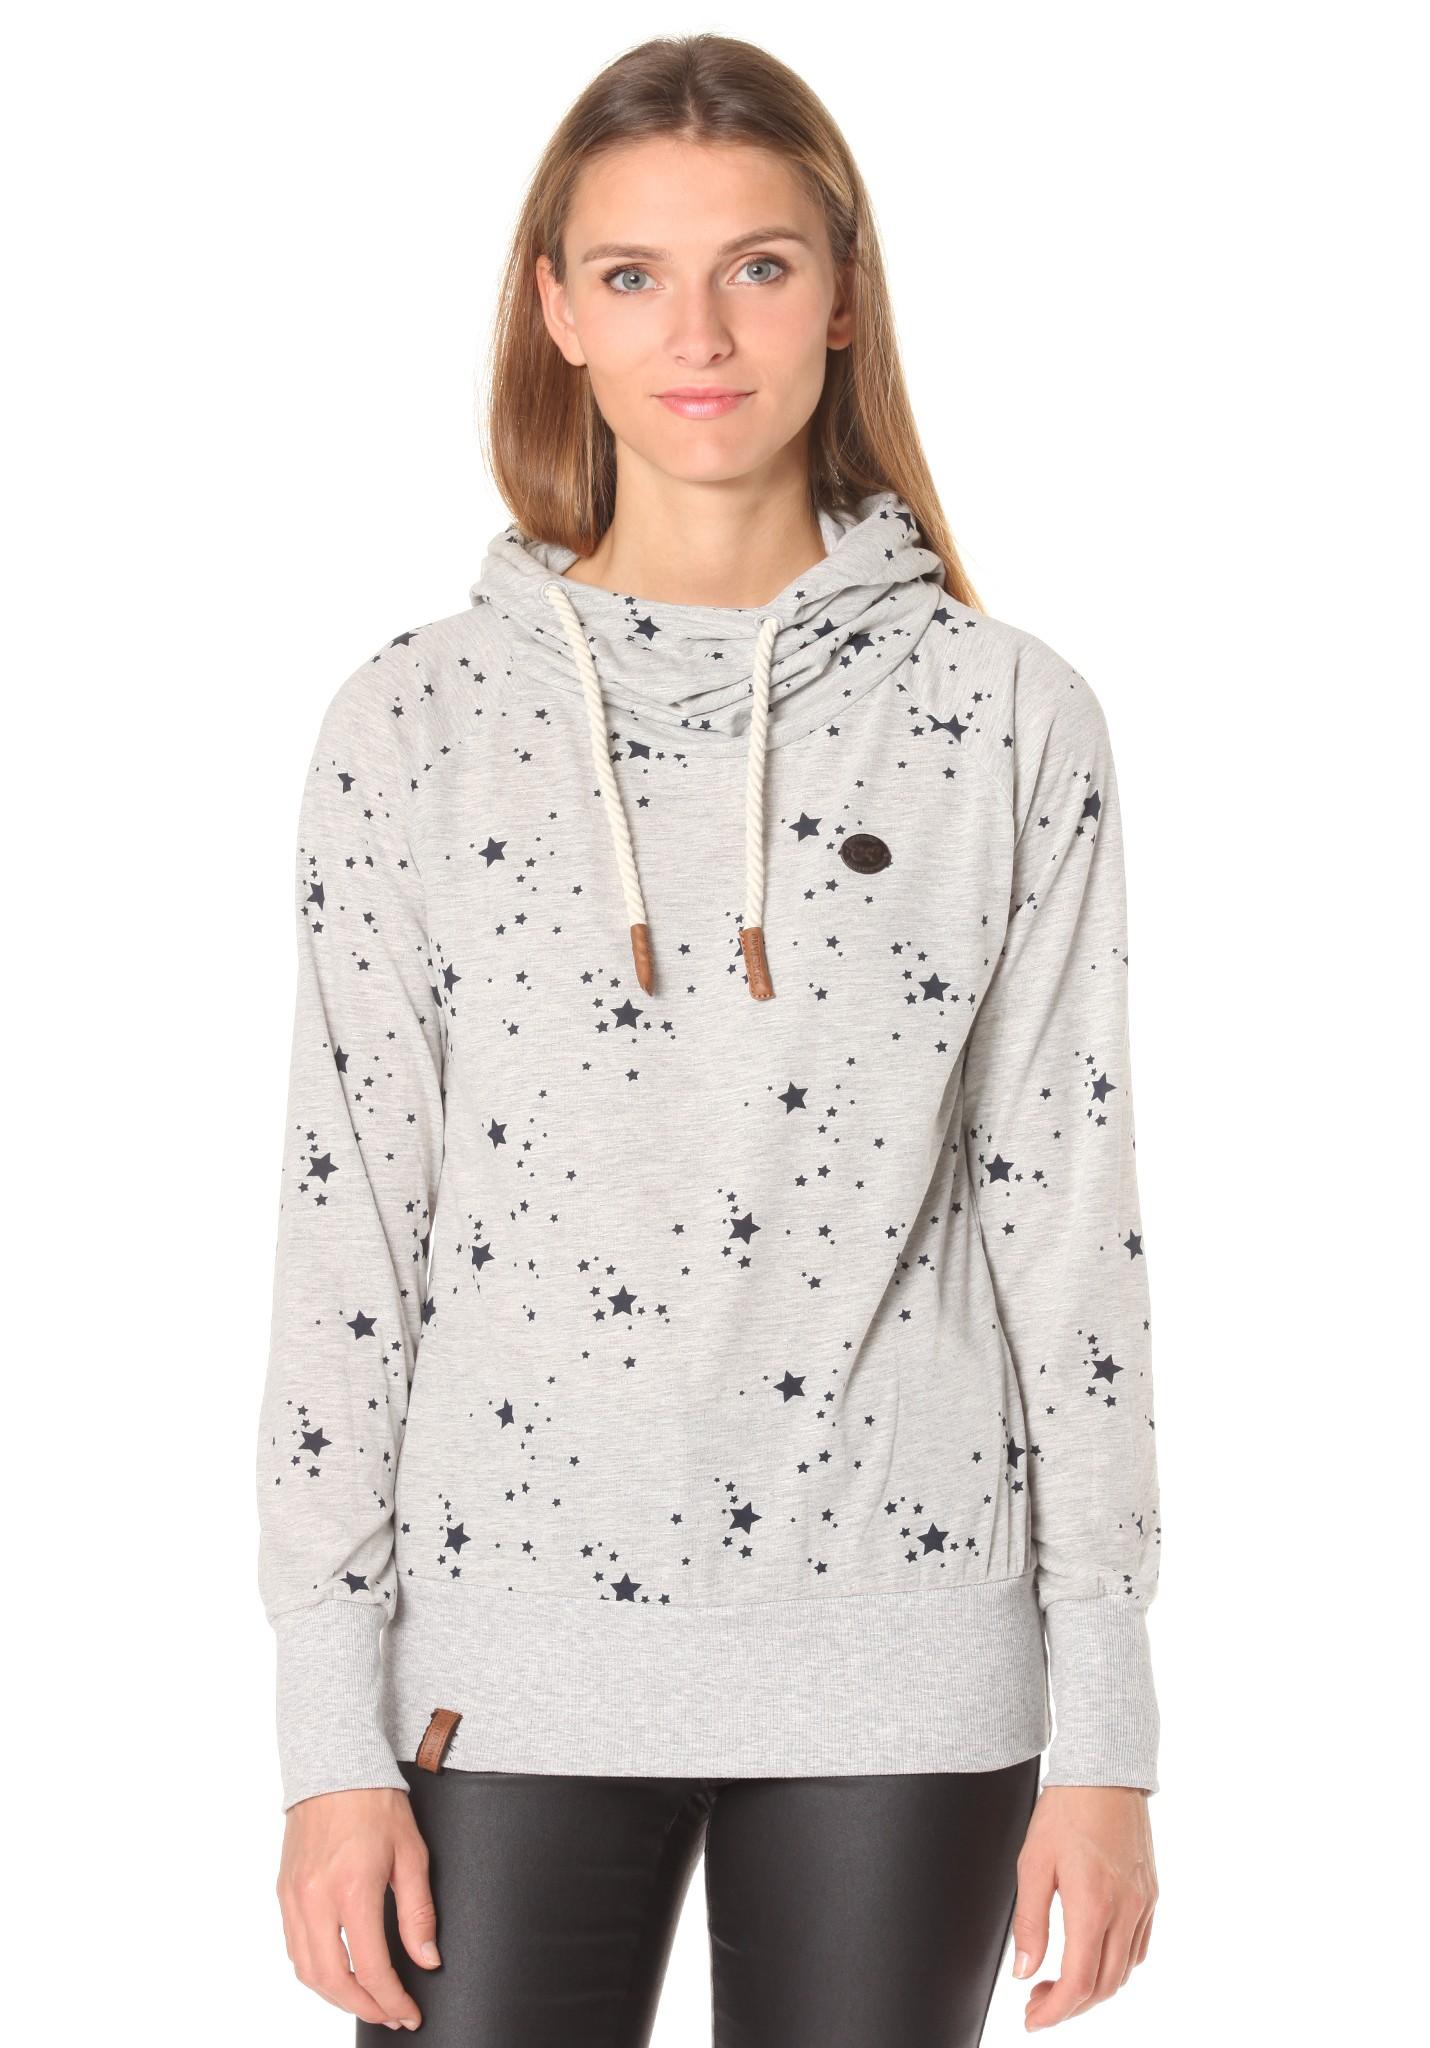 neu naketano gazelle schnelle damen kapuzenpullover pullover hoodie ebay. Black Bedroom Furniture Sets. Home Design Ideas